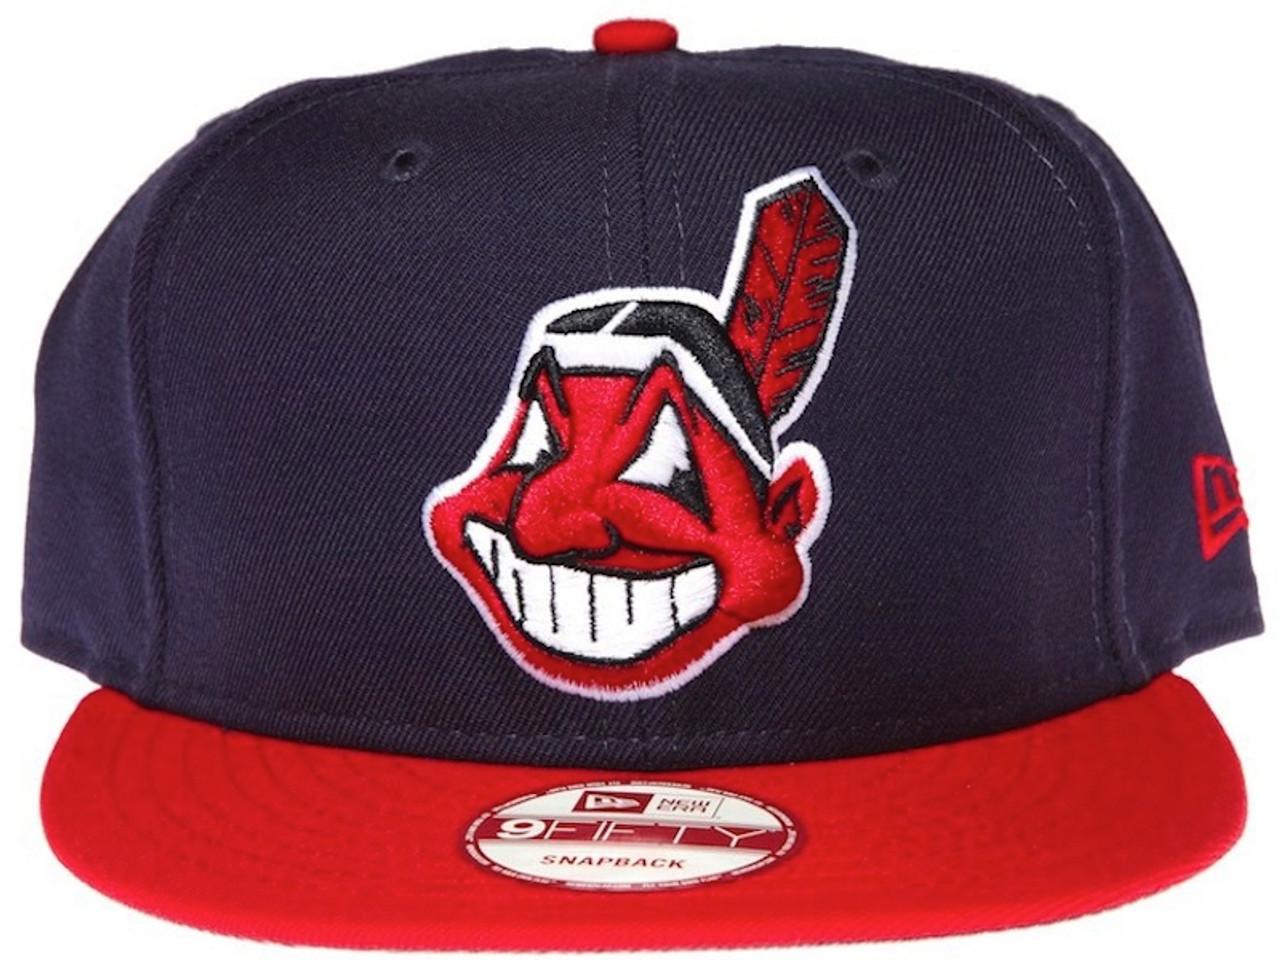 Cleveland Indians On Field New Era Snapback Hat - KCT Streetwear New ... 931f9a3810f6